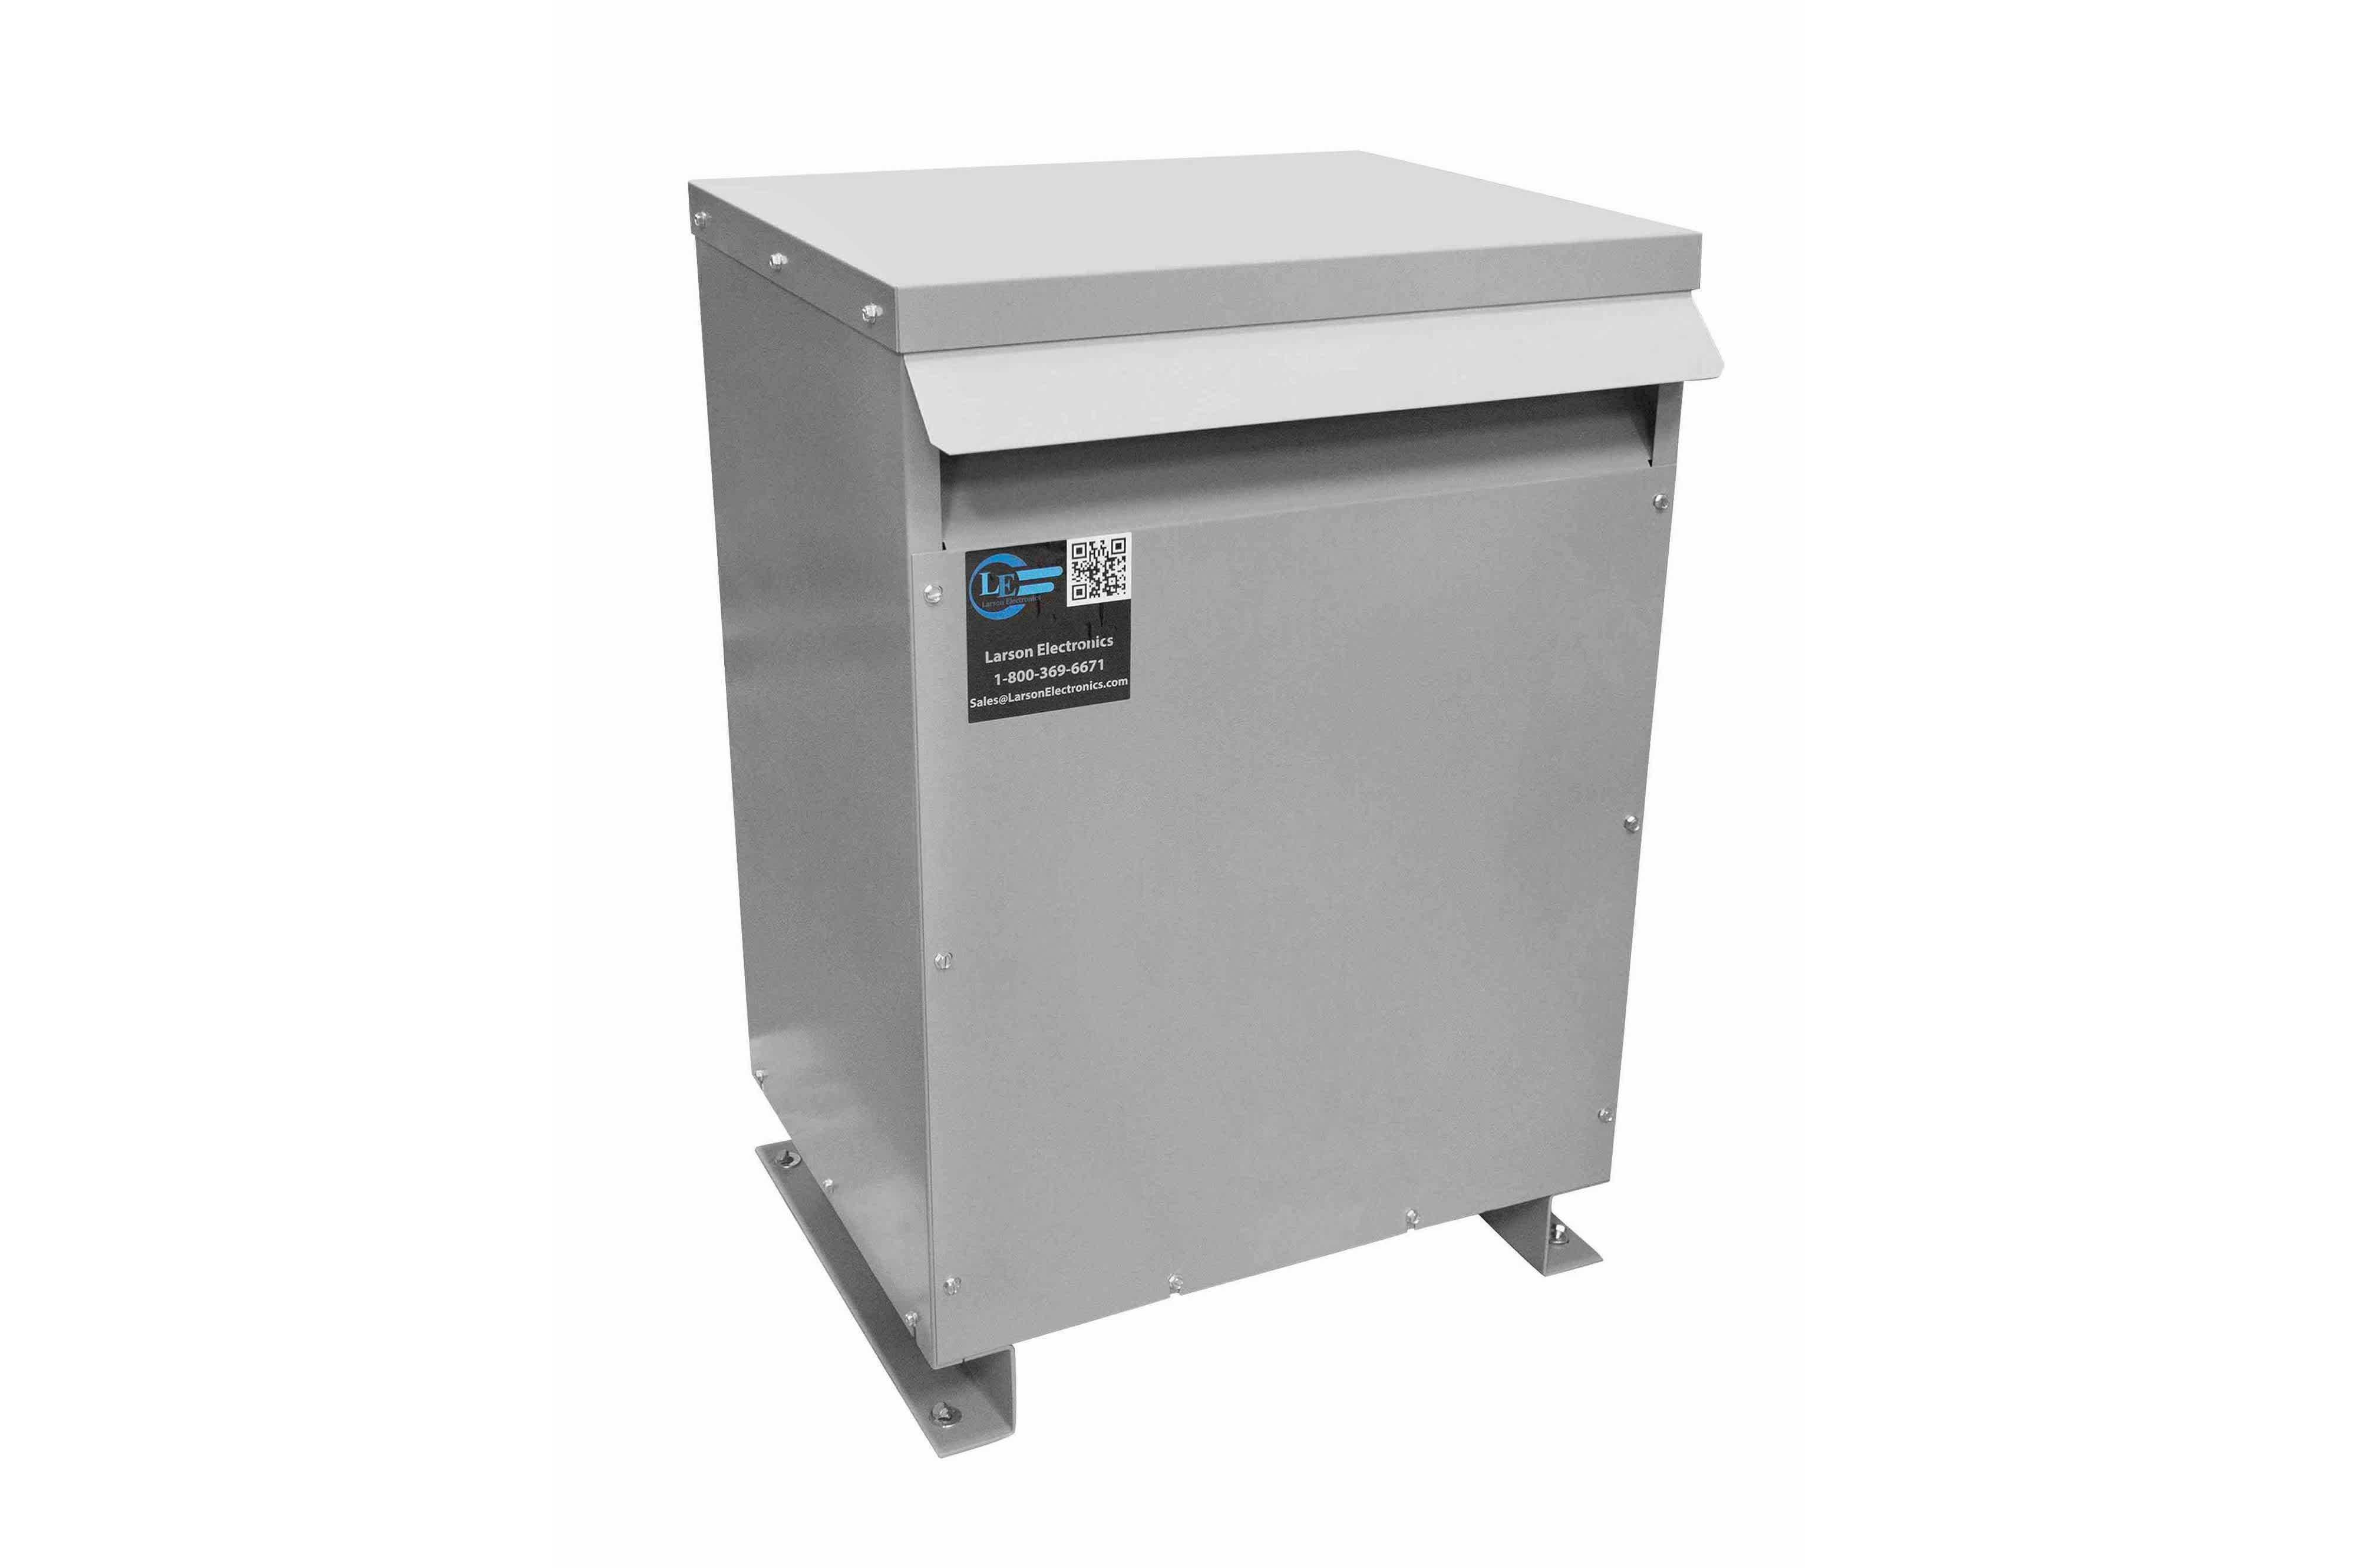 1000 kVA 3PH Isolation Transformer, 575V Wye Primary, 415V Delta Secondary, N3R, Ventilated, 60 Hz